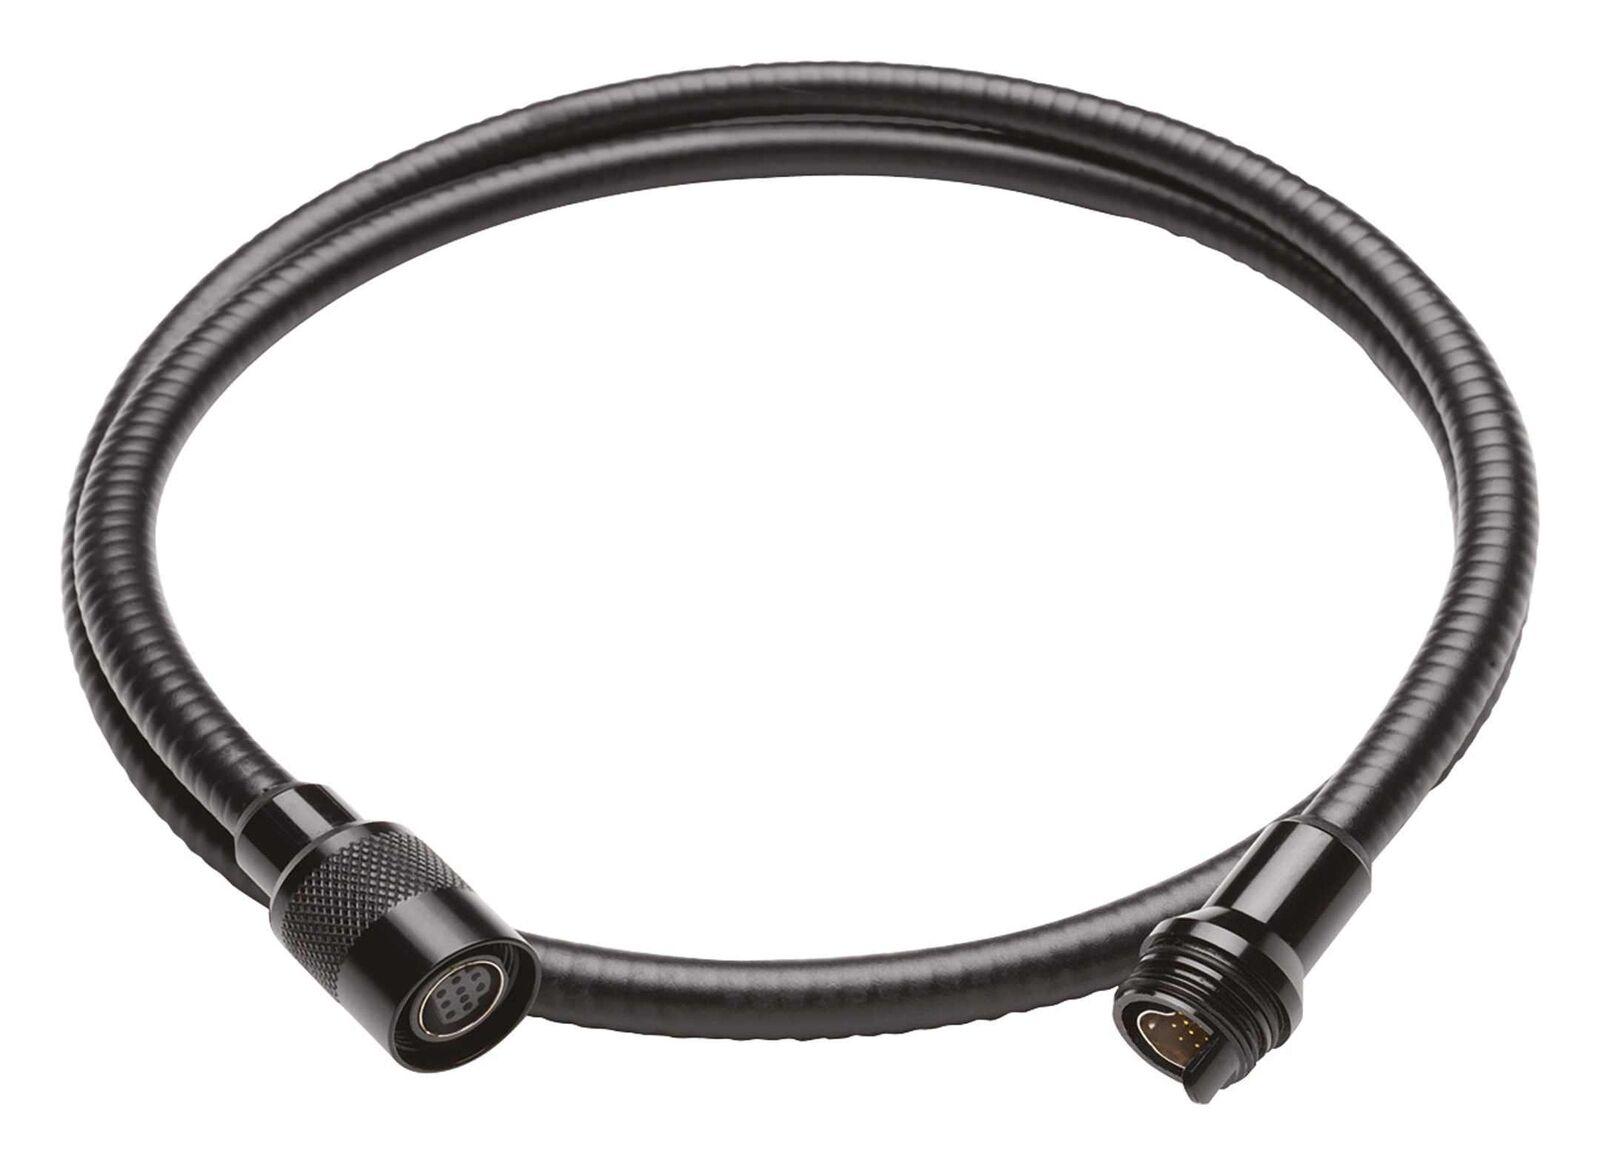 Ridgid Verlängerung flexibel 90cm micro + Explorer - 37108